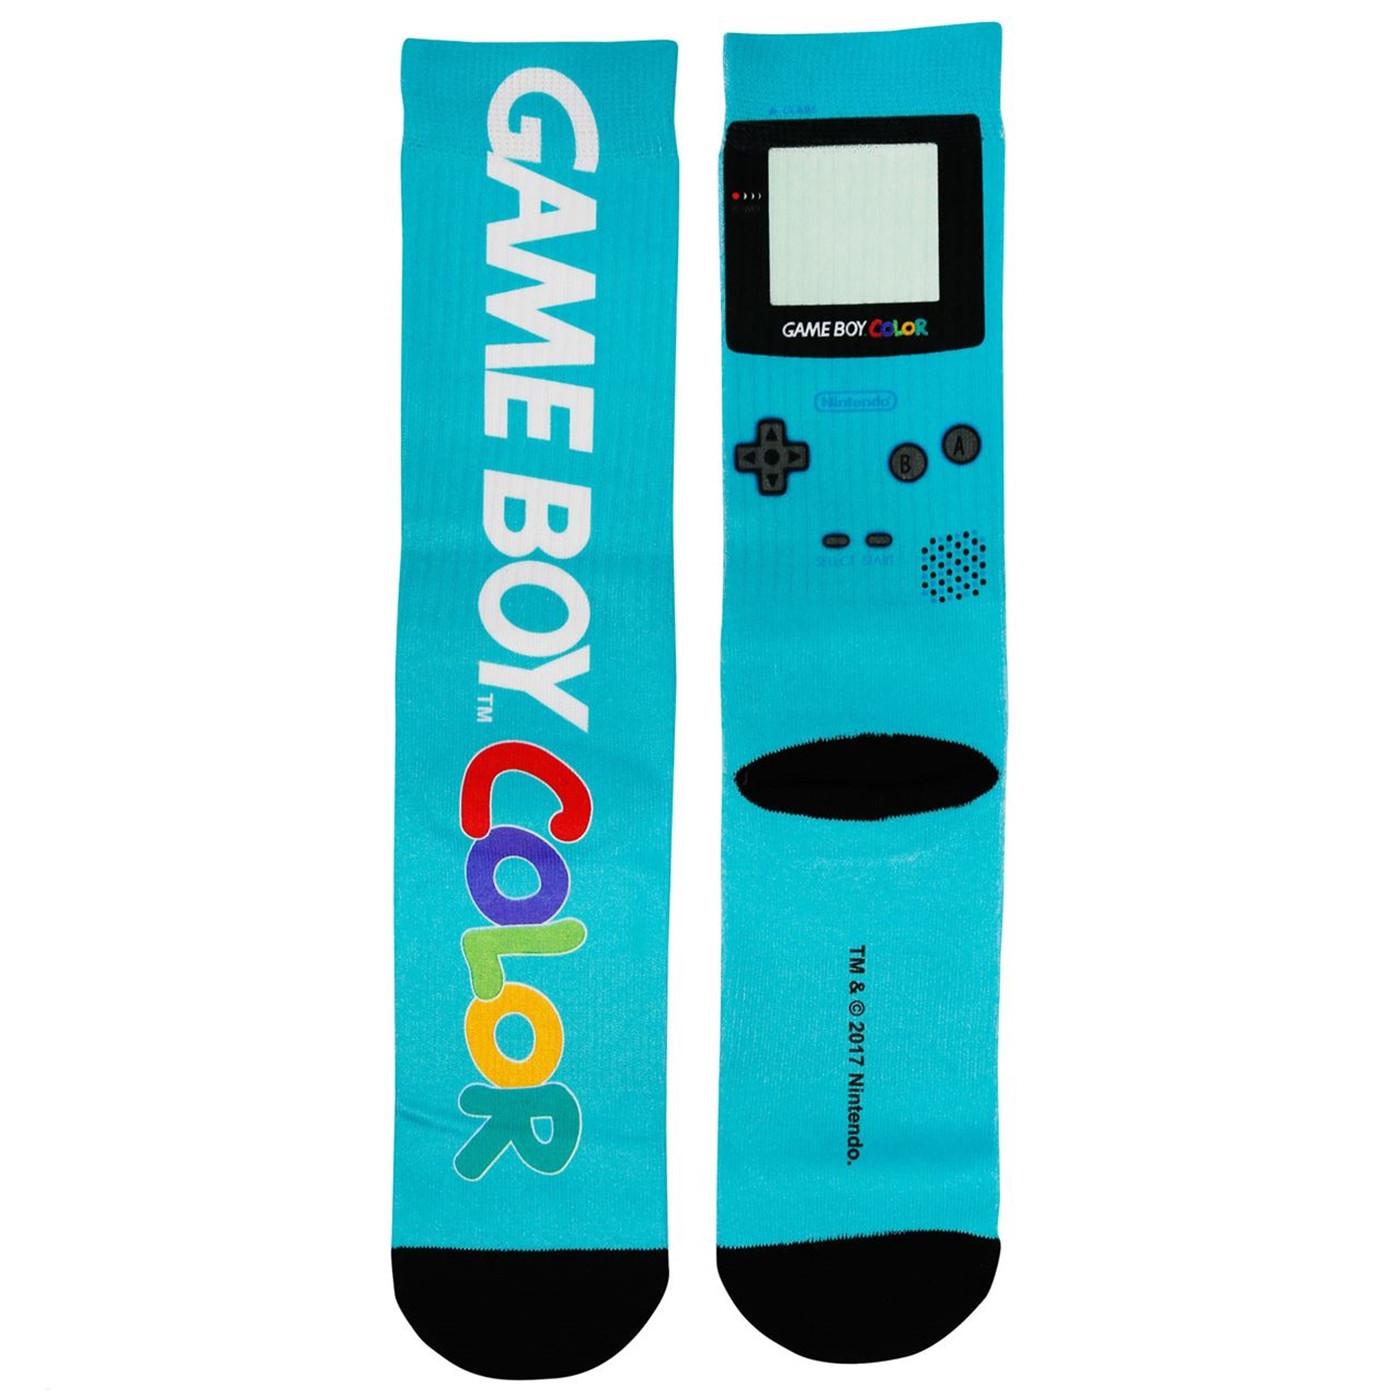 Nintendo Gameboy Color Socks